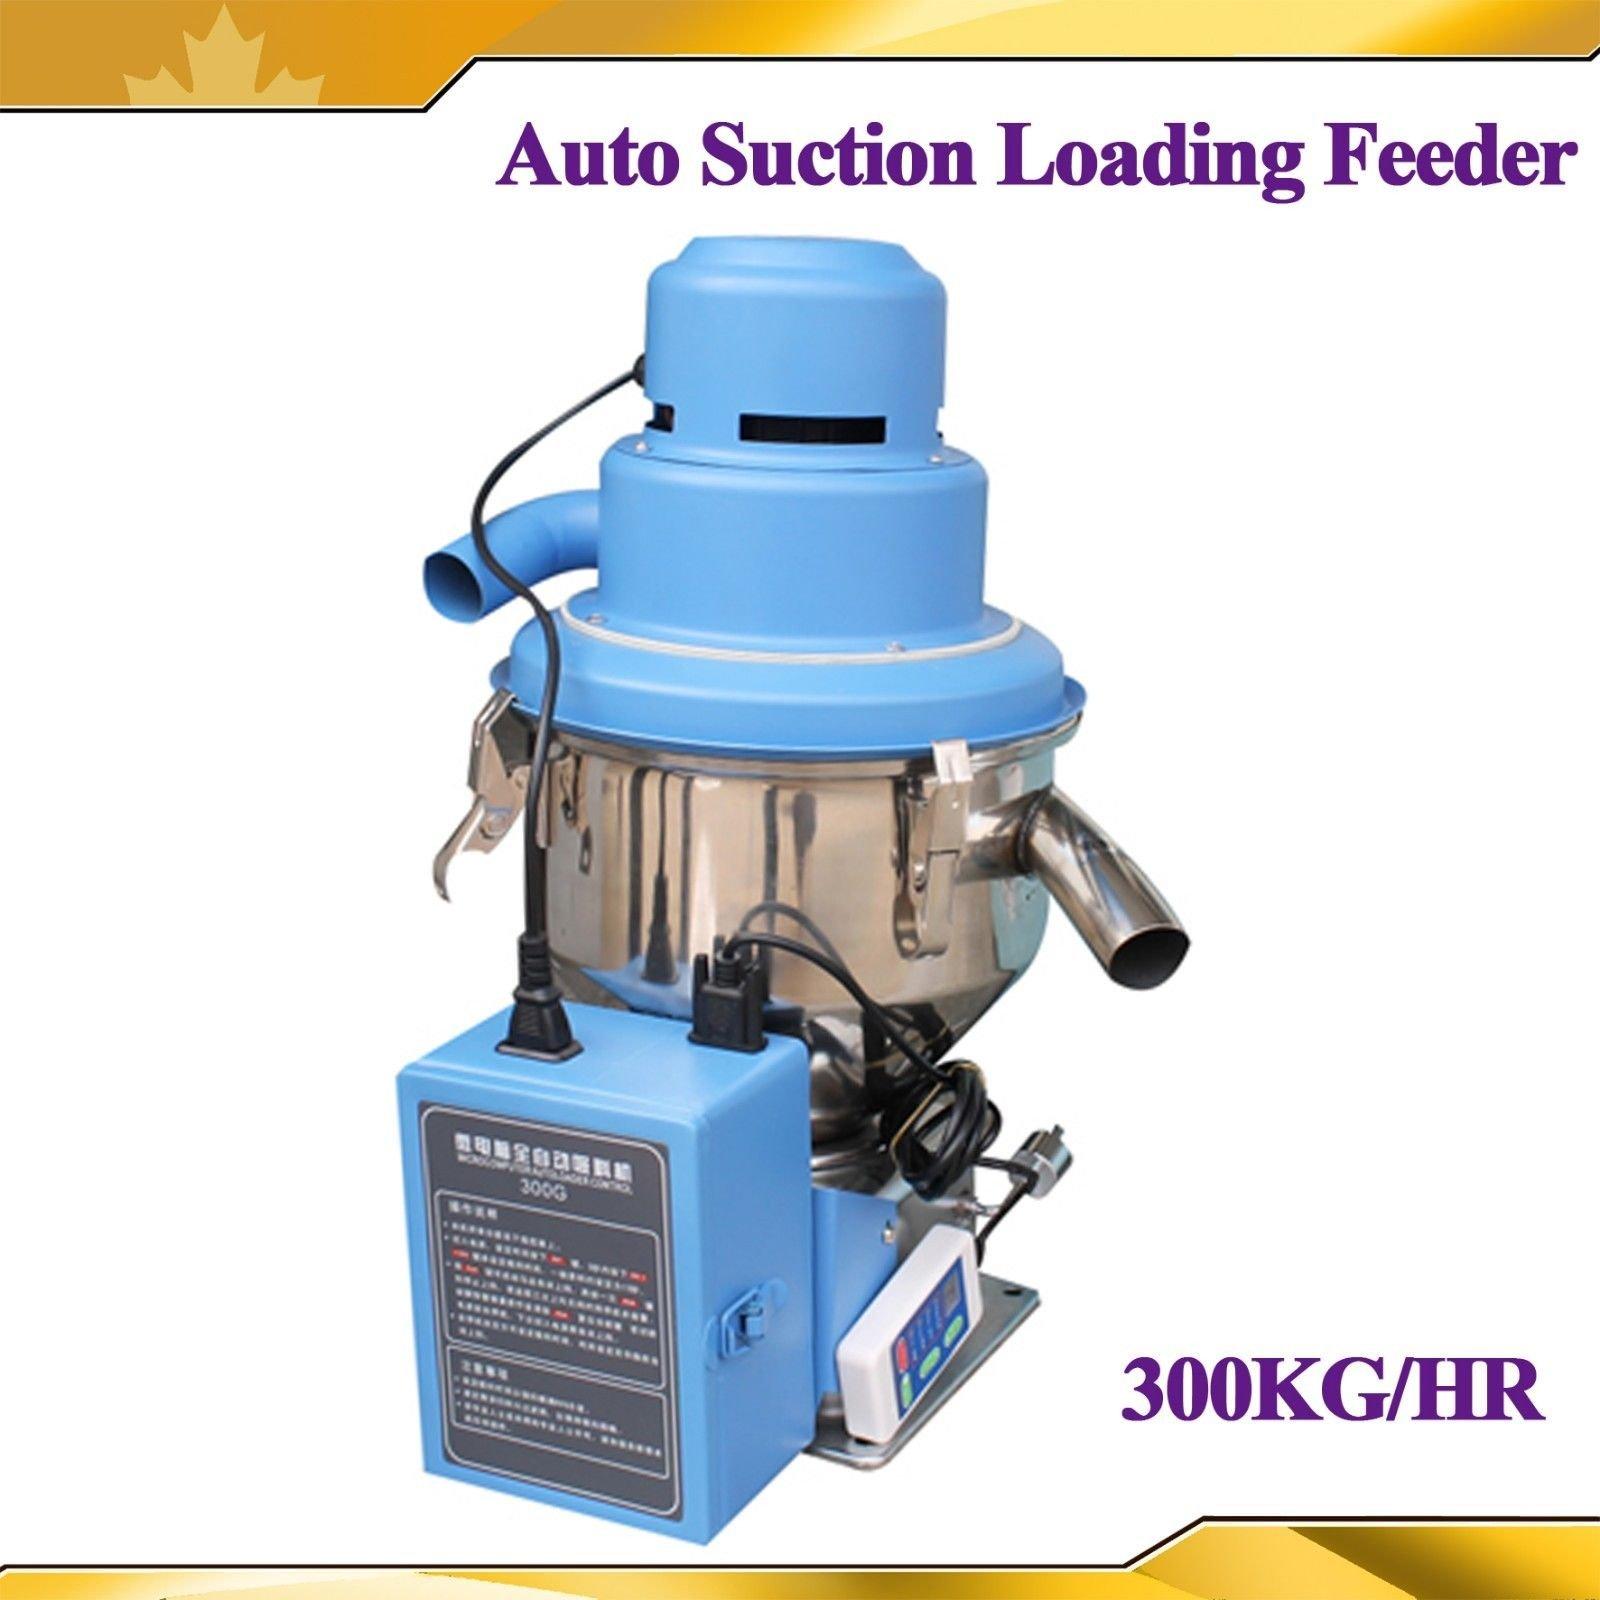 Auto Pro Loader Feeder 300kg/h Material Feeding Material Feeding Suction Capacity Machine 220V